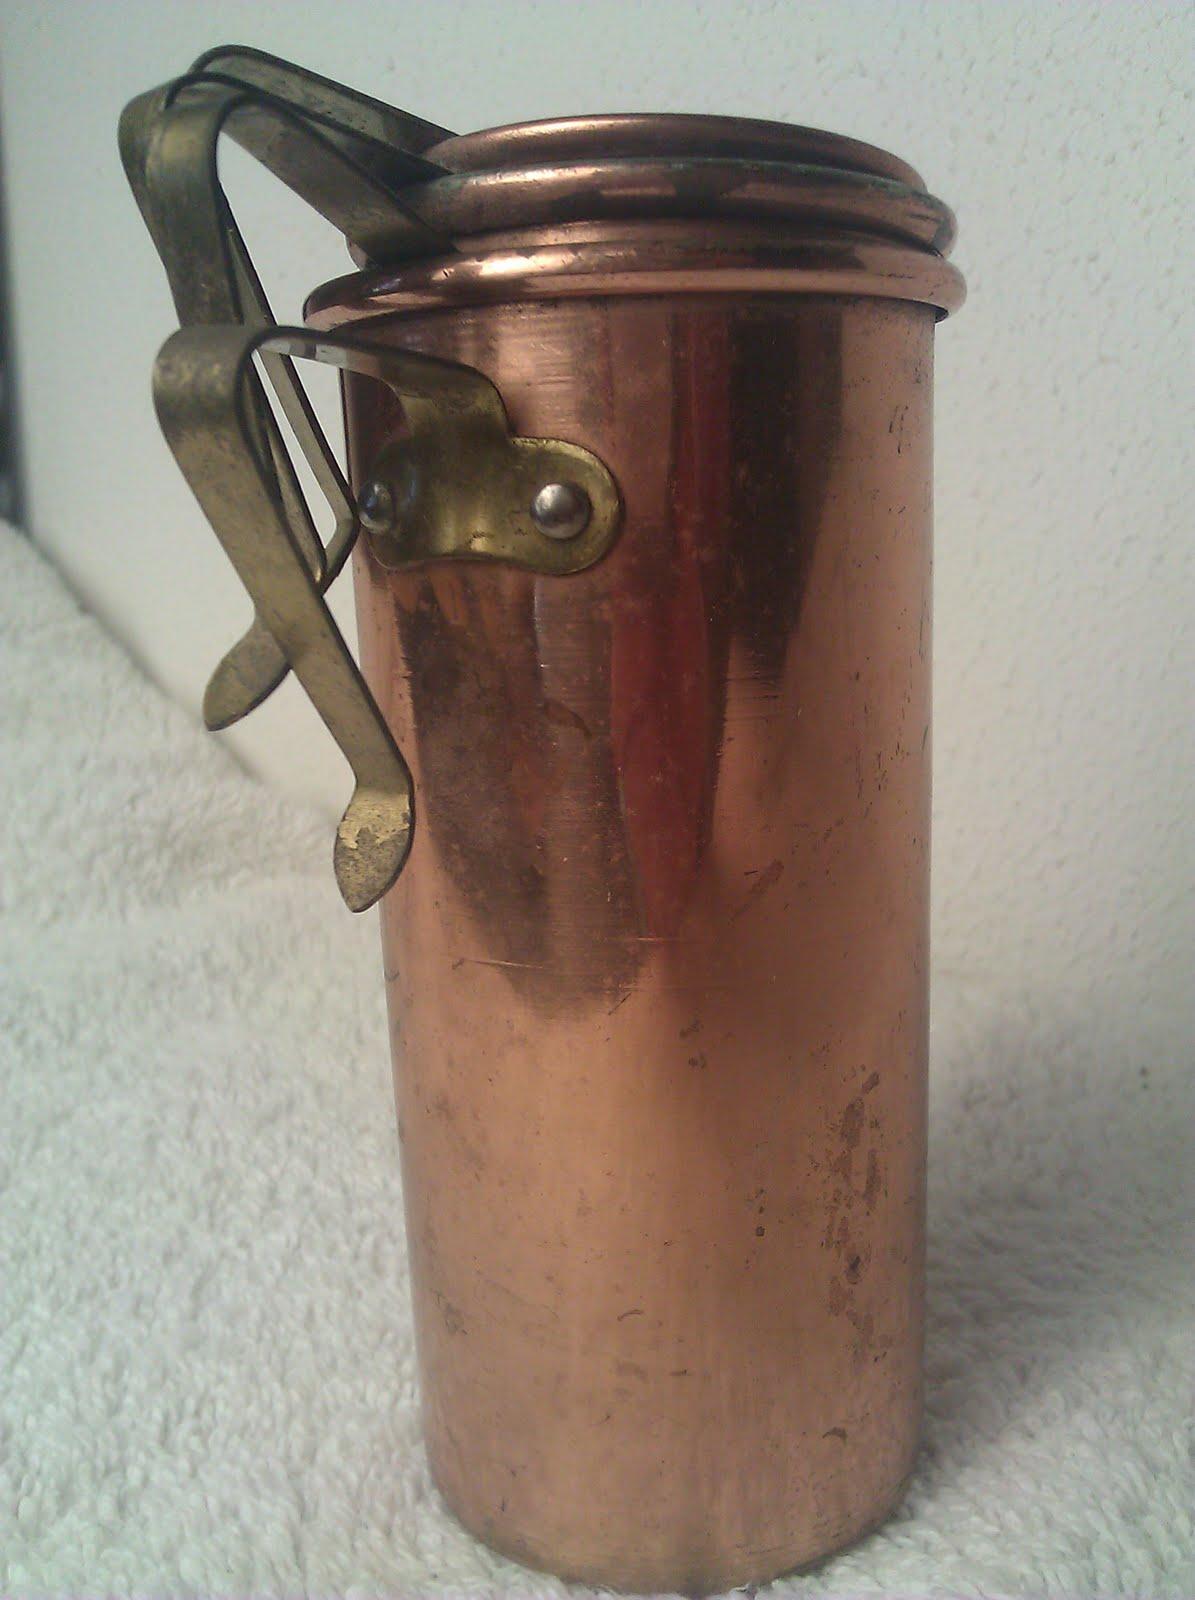 cleaning house vintage copper stackable measuring cups for sale. Black Bedroom Furniture Sets. Home Design Ideas